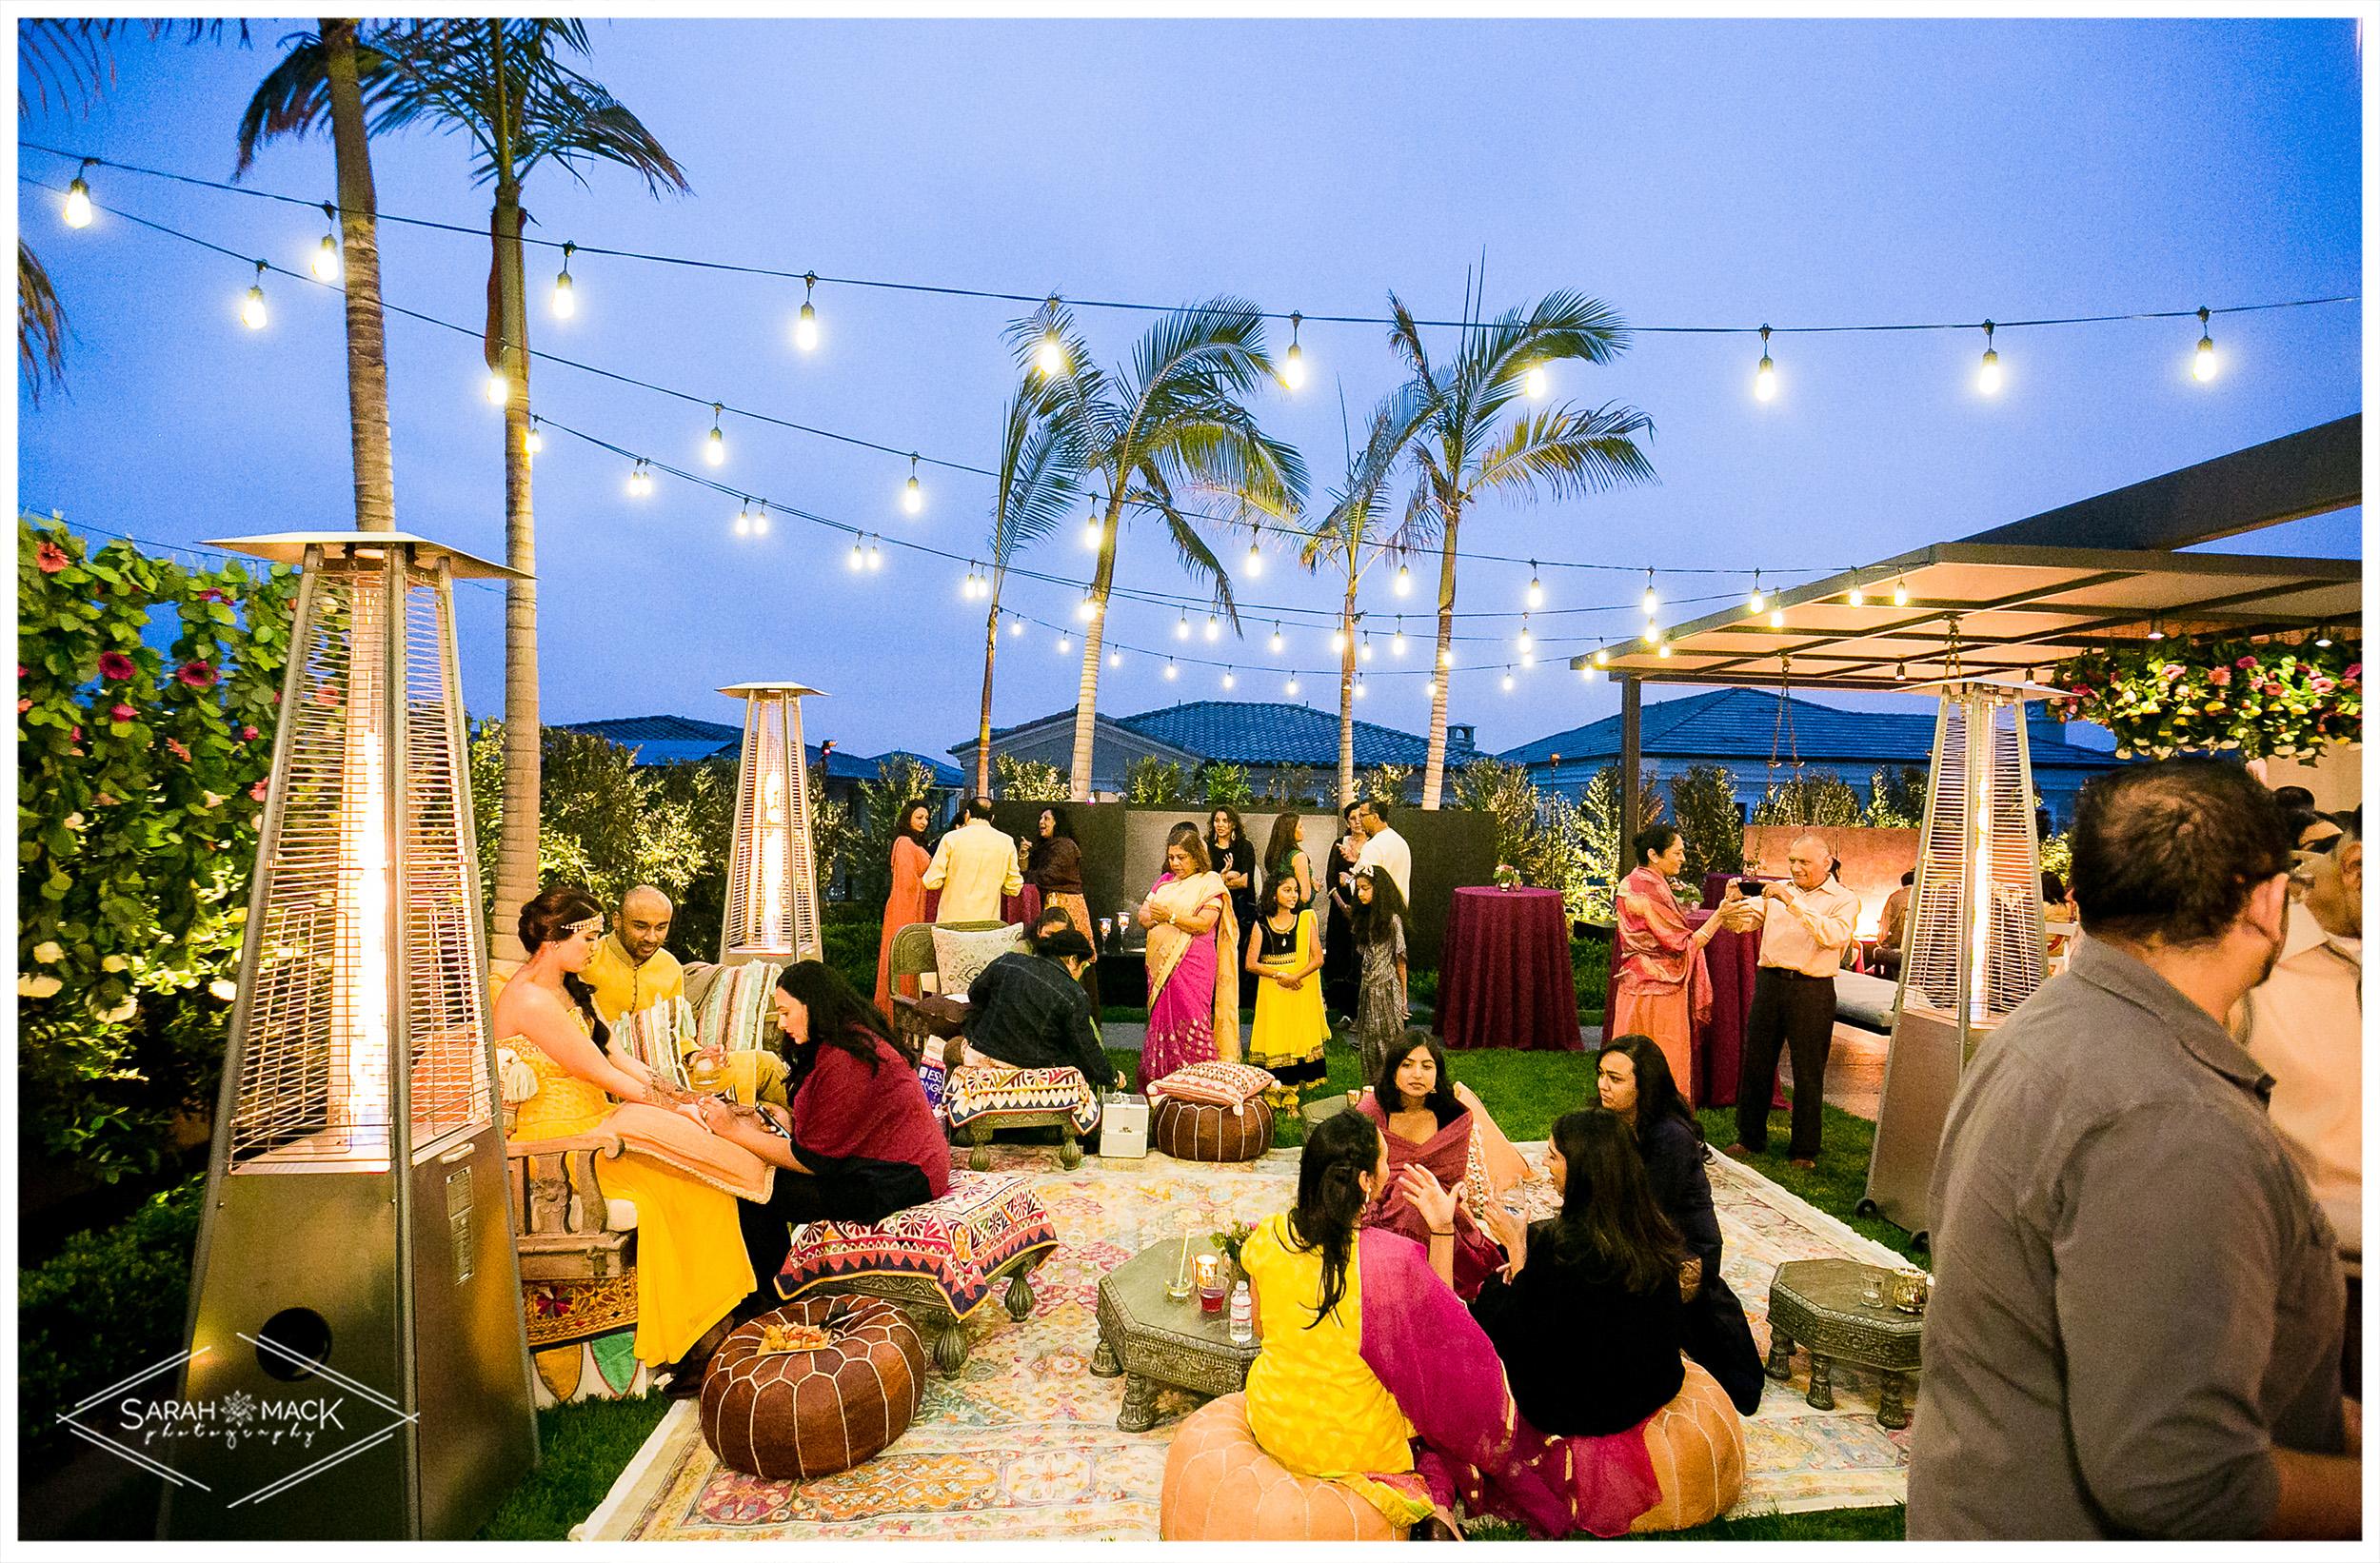 PR-Irvine-Mendhi-Indian-Wedding-Photography-15.jpg